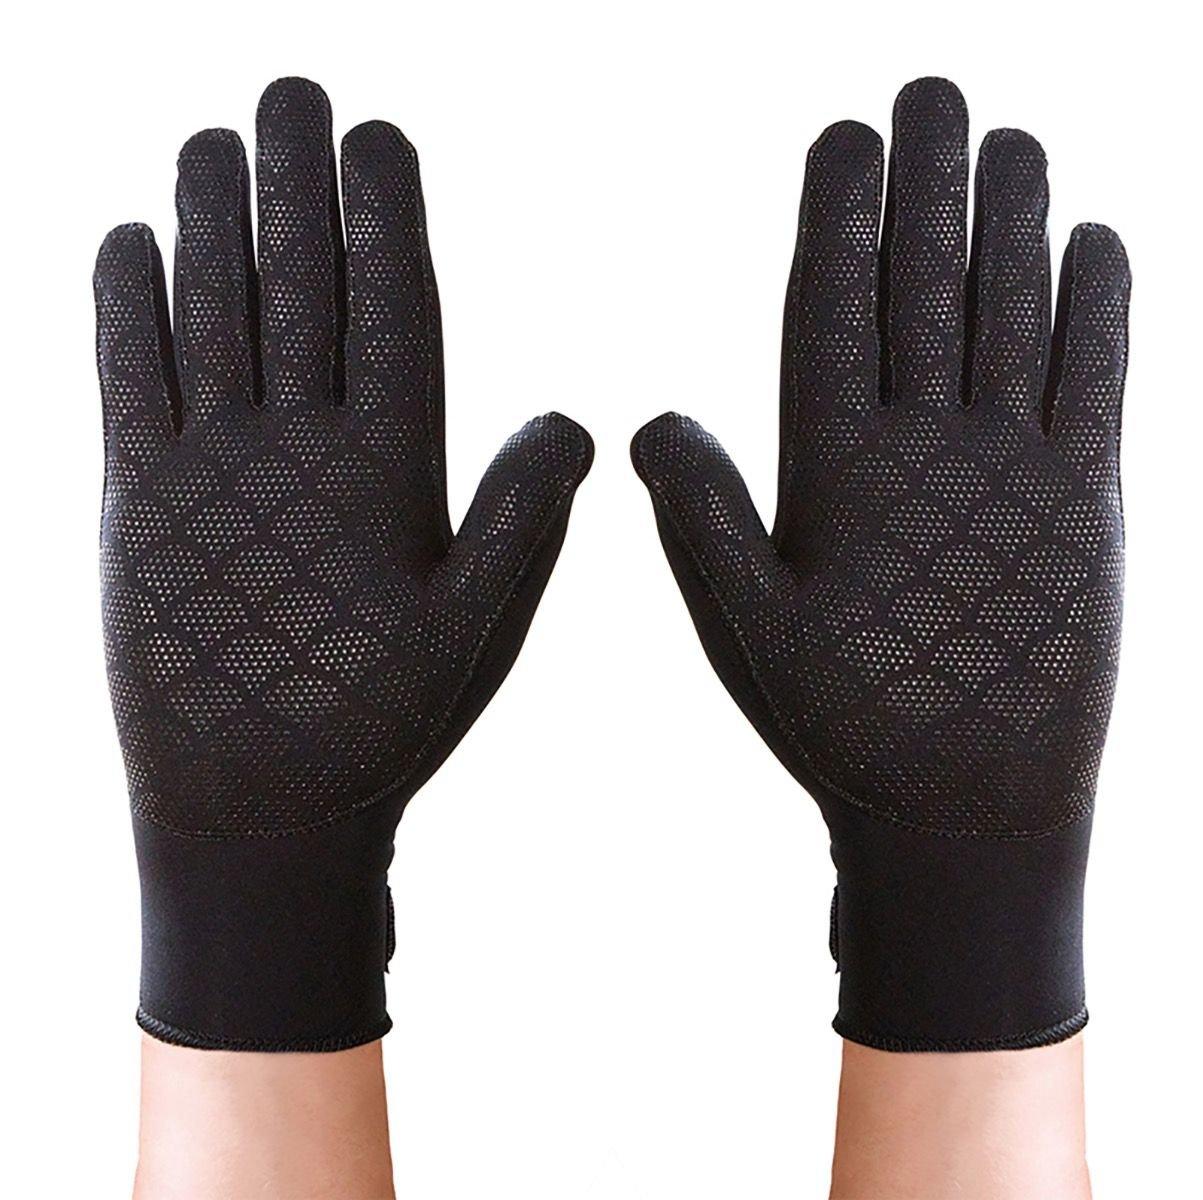 Ranking TOP11 Thermoskin Arthritis Gloves Full Max 87% OFF Black Finger Medium